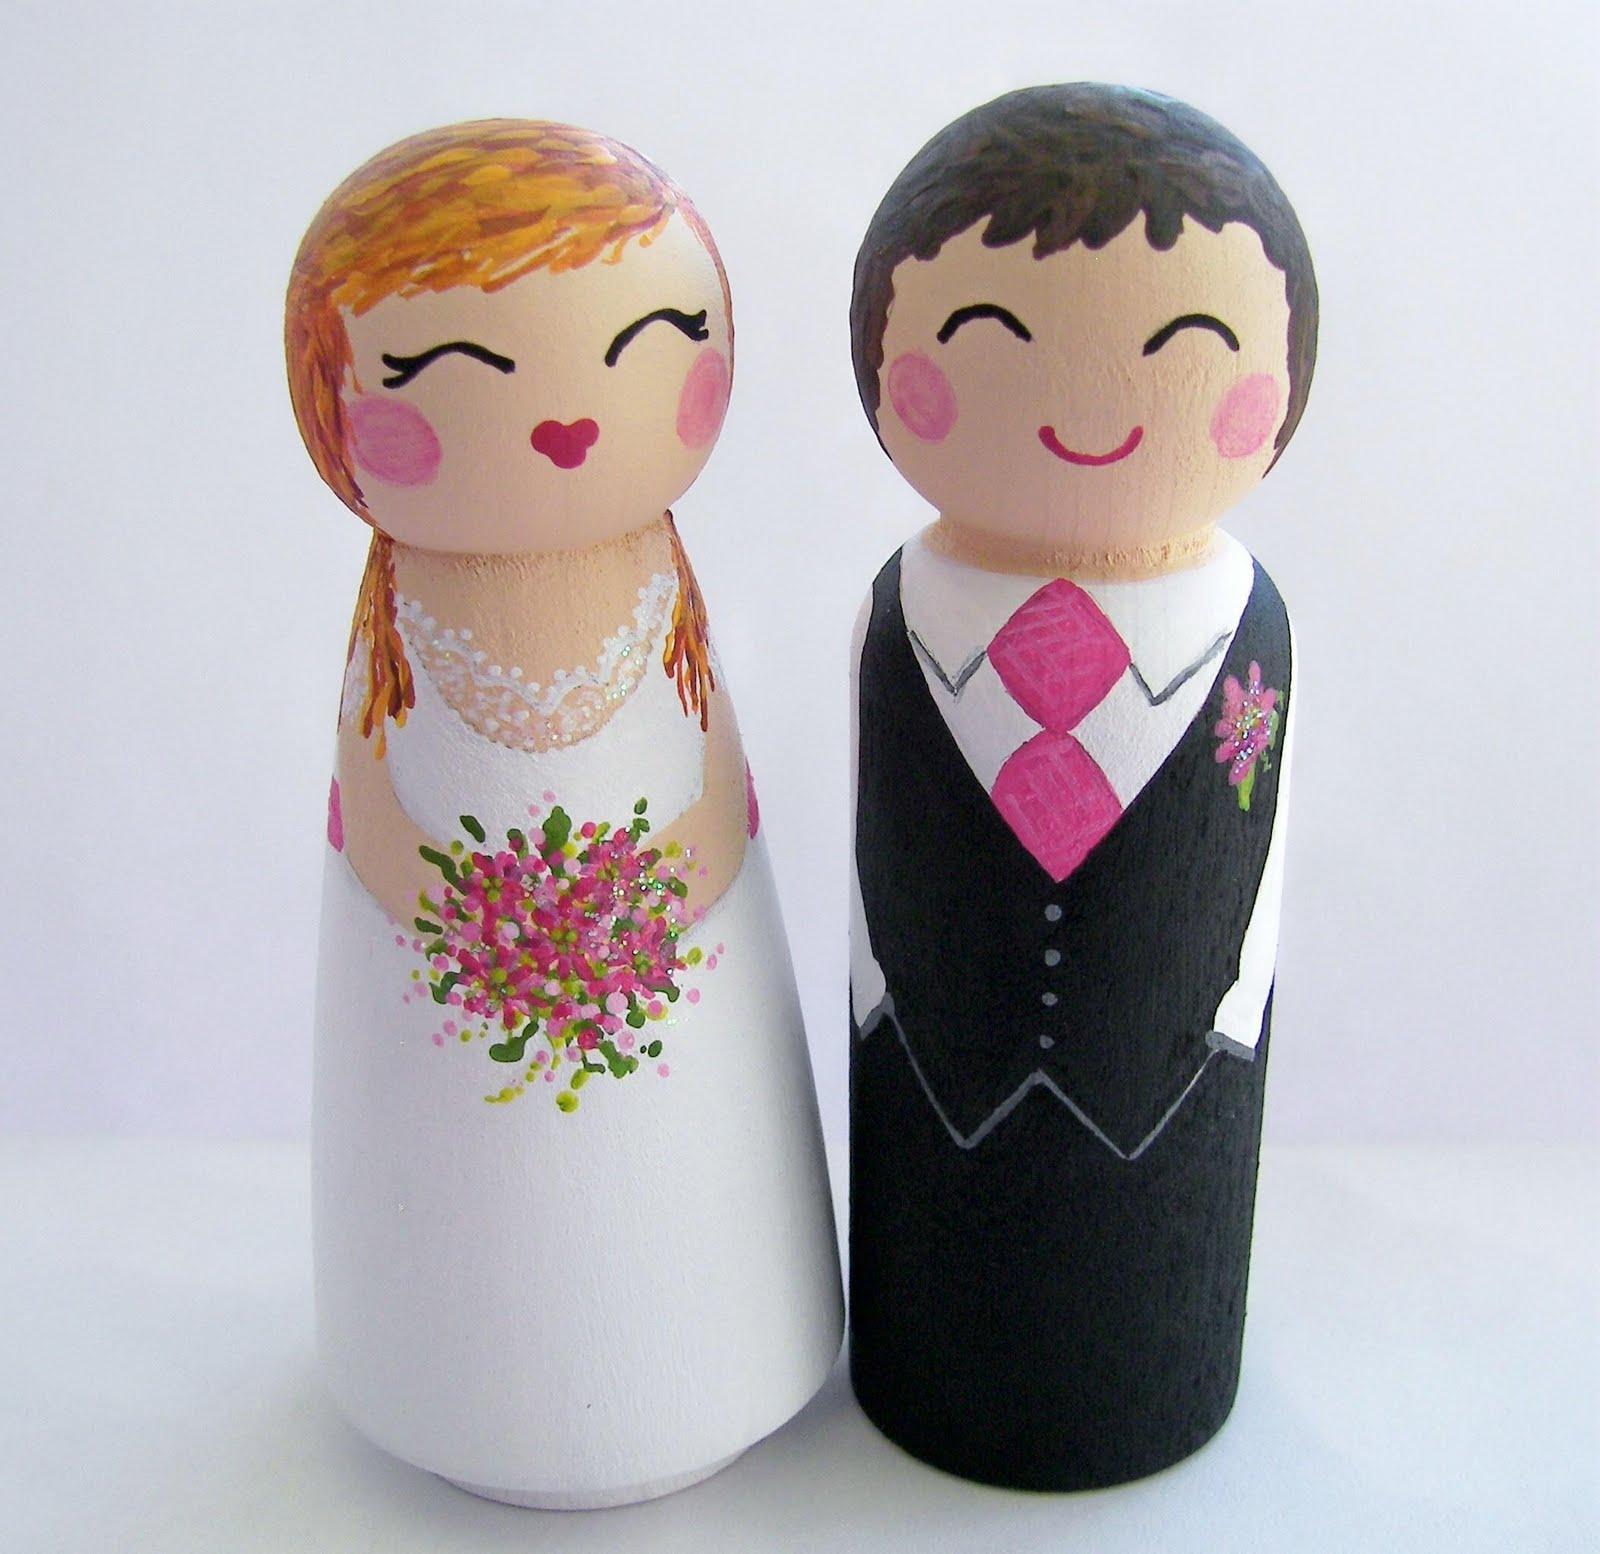 Citrus Wedding Custom Cake Toppers